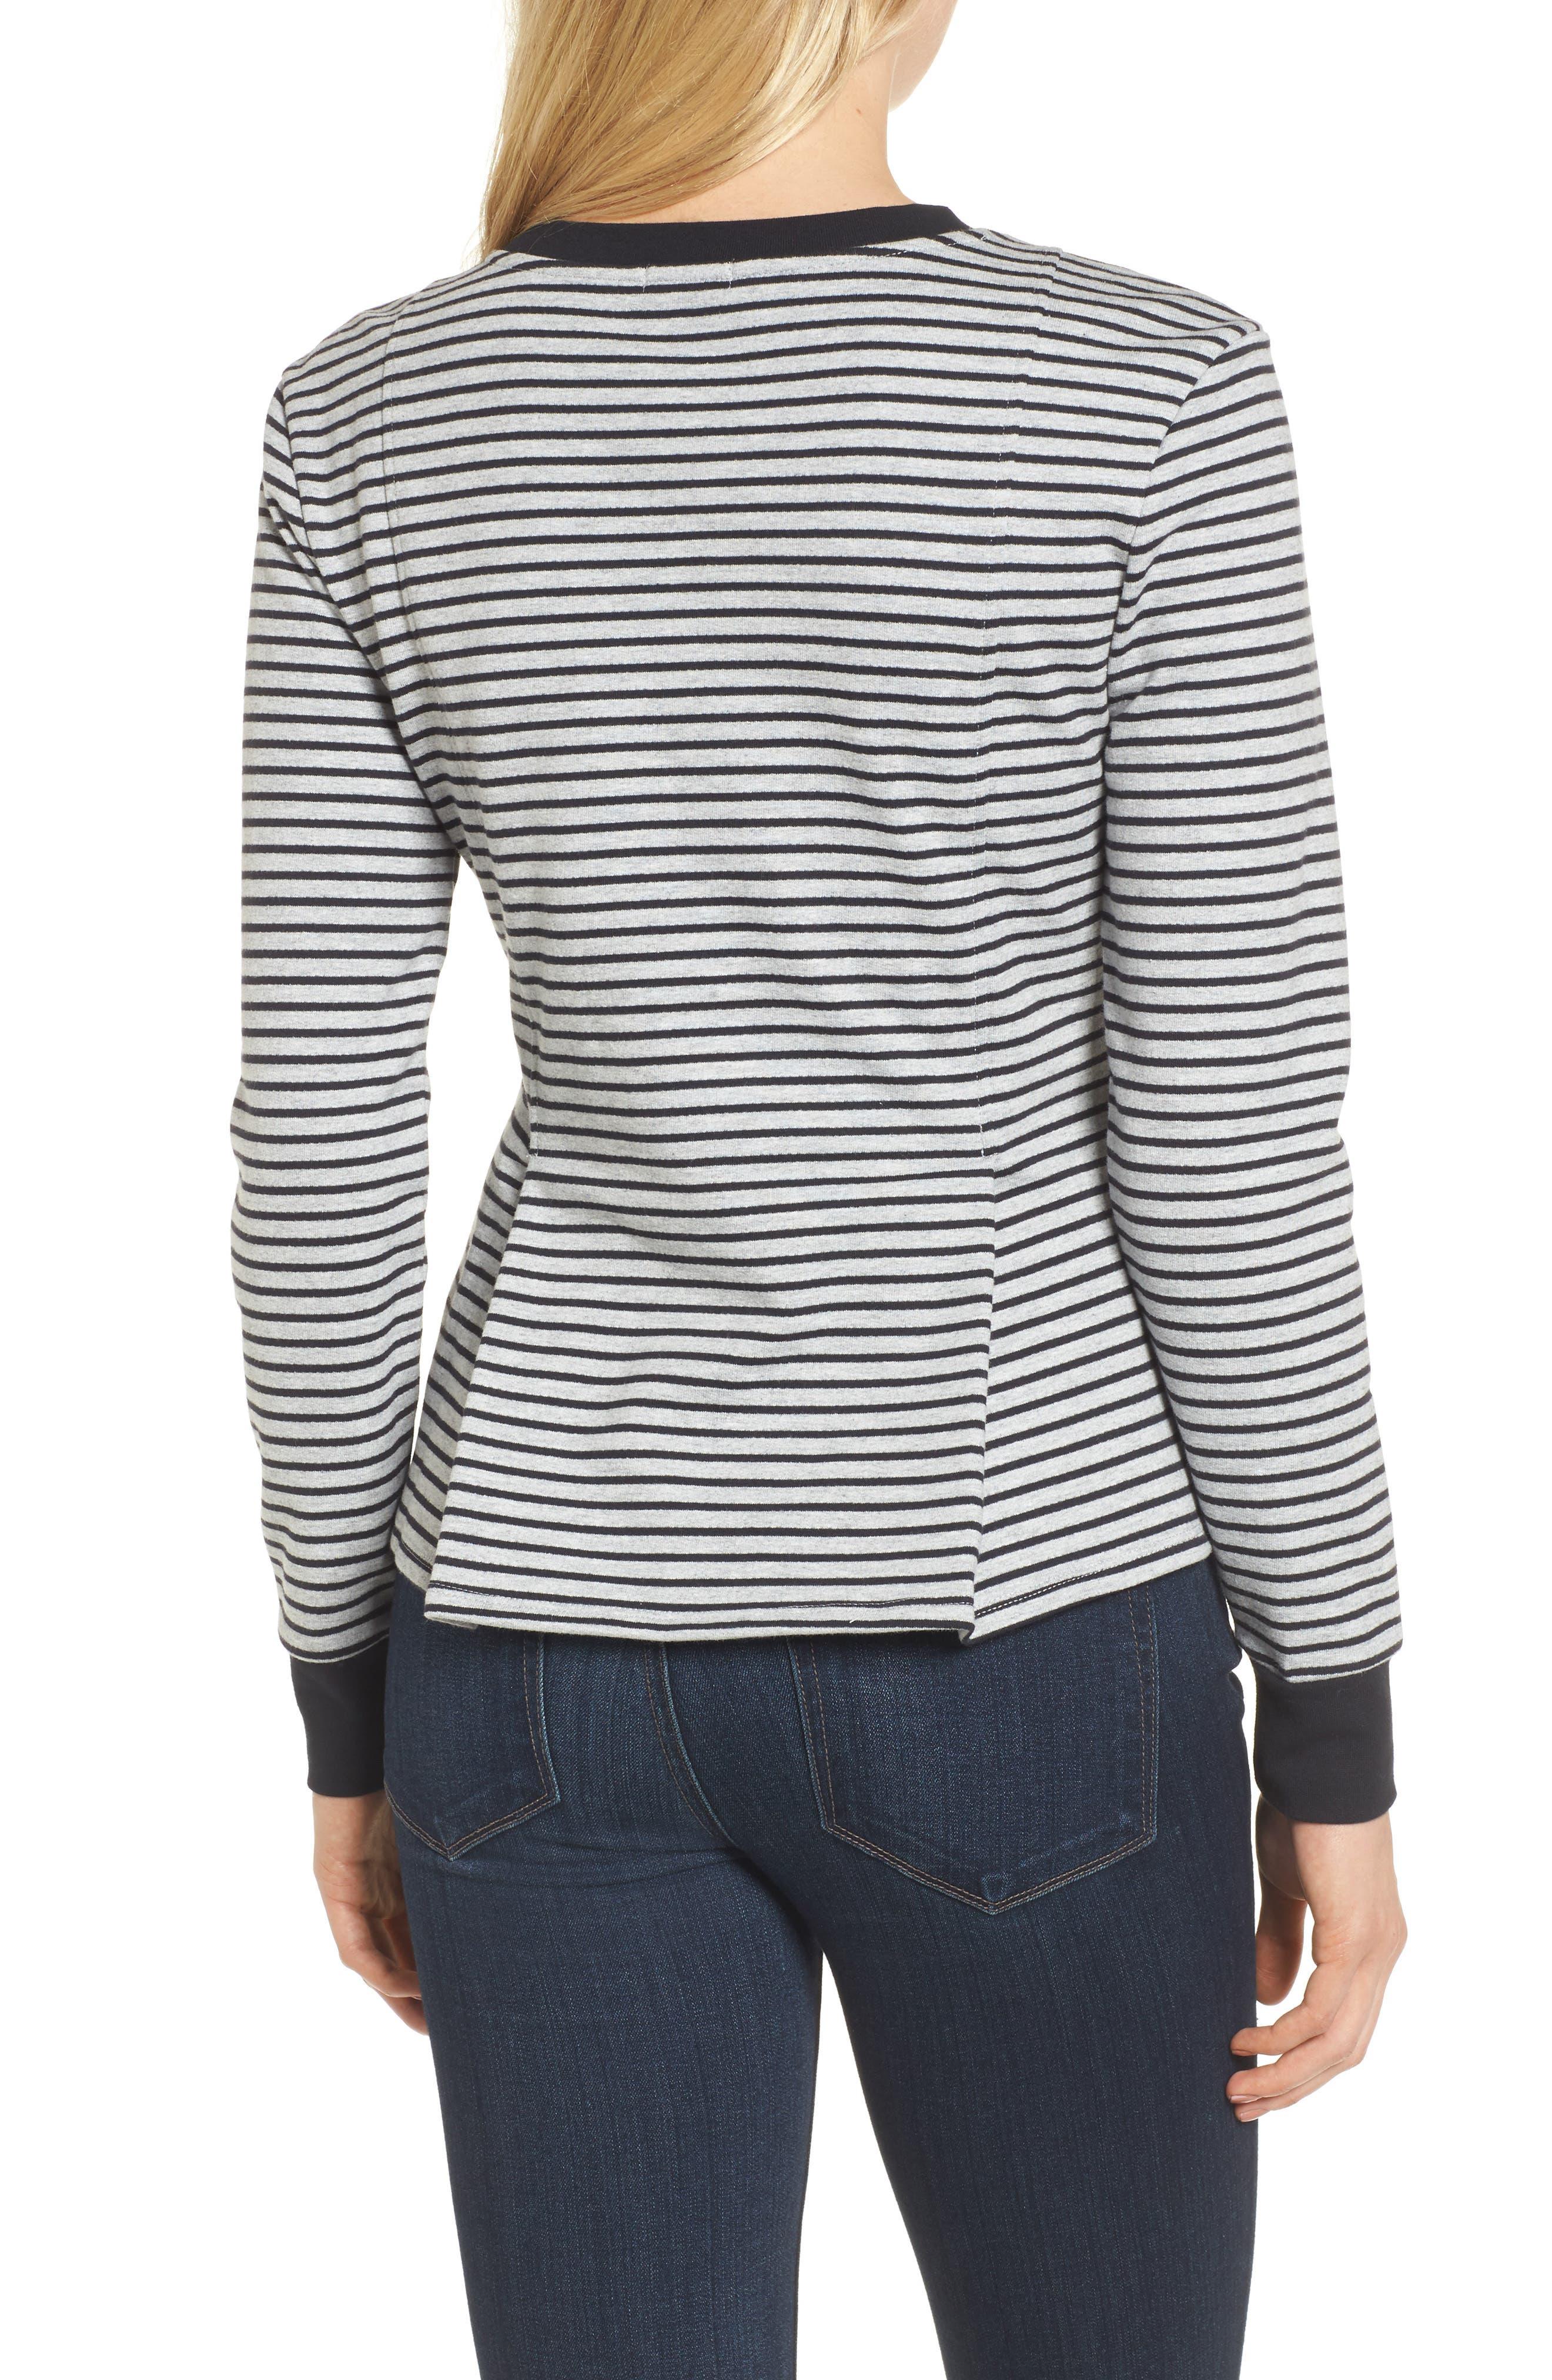 Pleated Sweatshirt,                             Alternate thumbnail 2, color,                             Grey Heather- Navy Seam Stripe